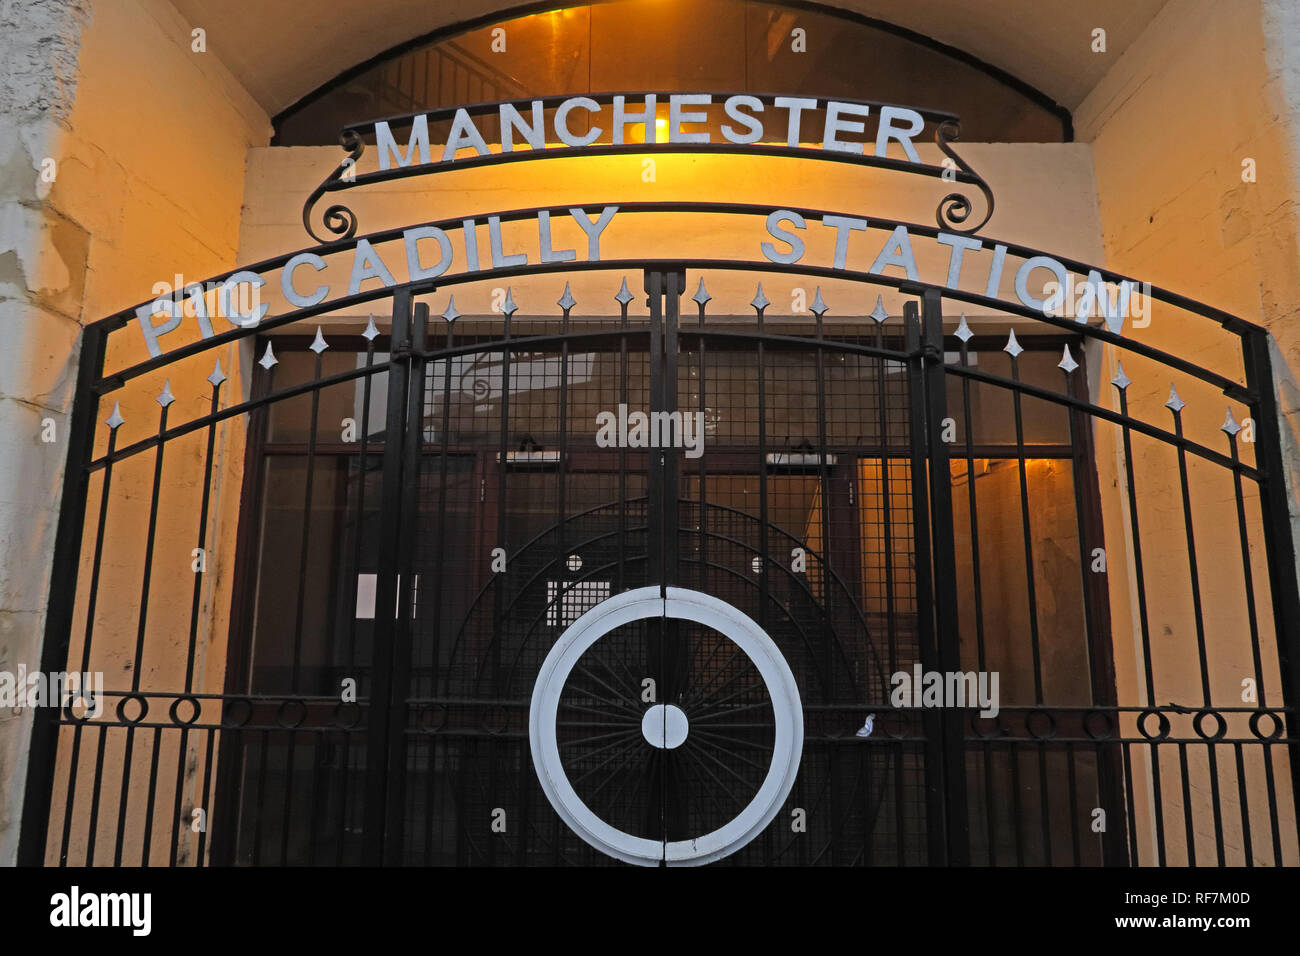 Laden Sie dieses Alamy Stockfoto Manchester Piccadilly Station Eingang, Fairfield, Street, North West England, Großbritannien, M1 2QF - RF7M0D